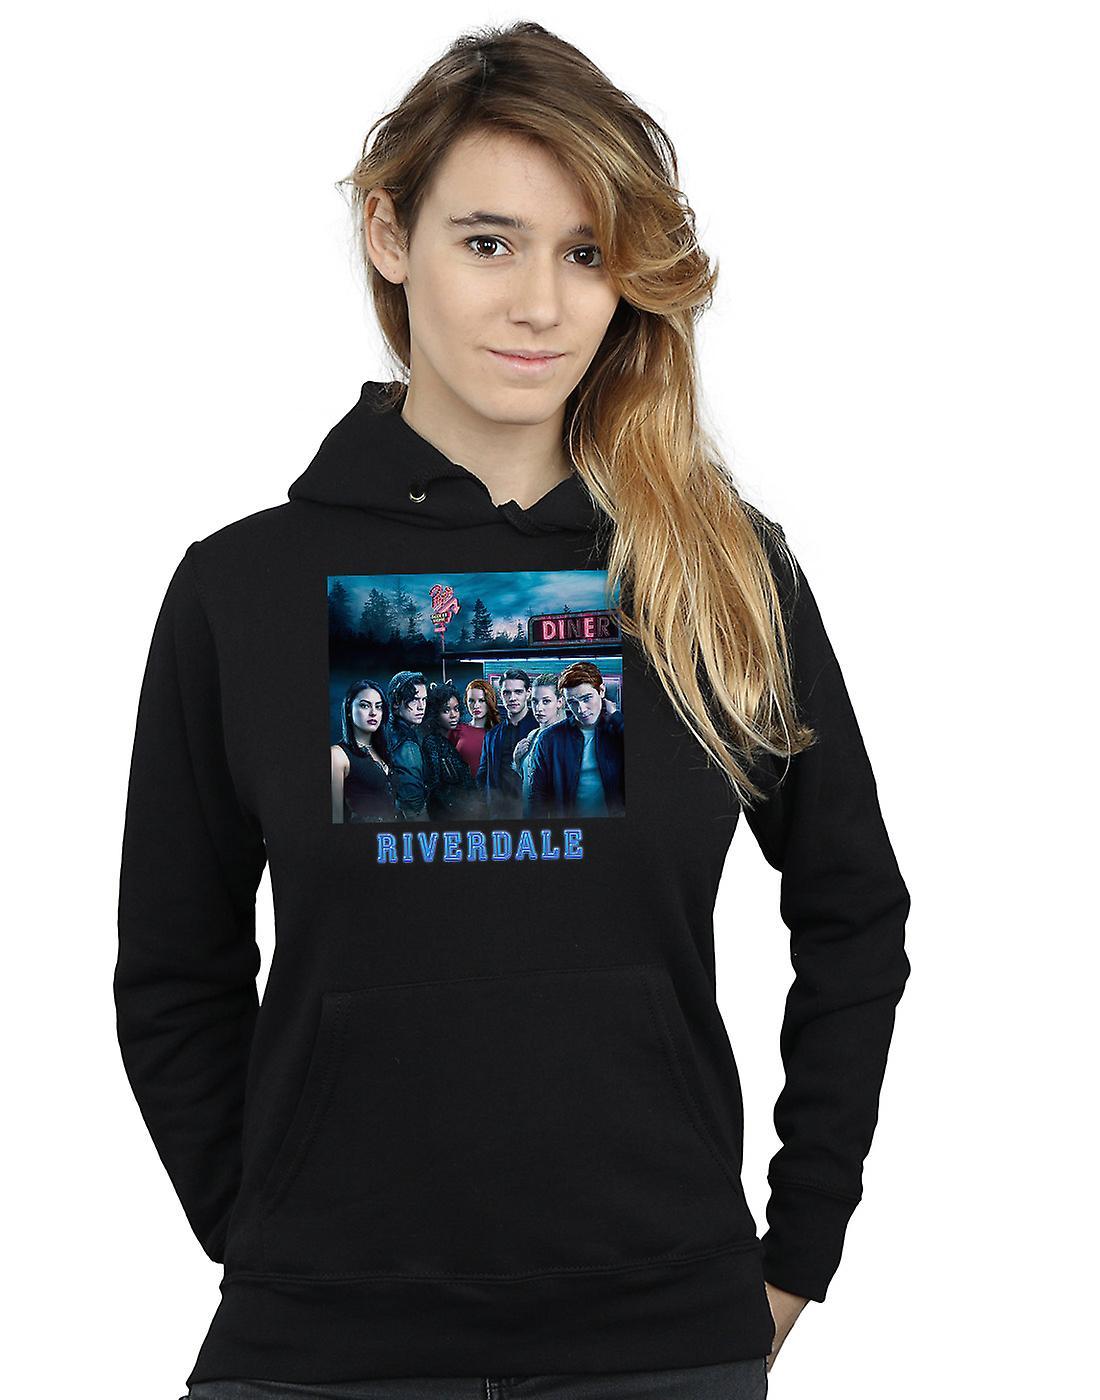 Riverdale Women's Diner Poster Hoodie